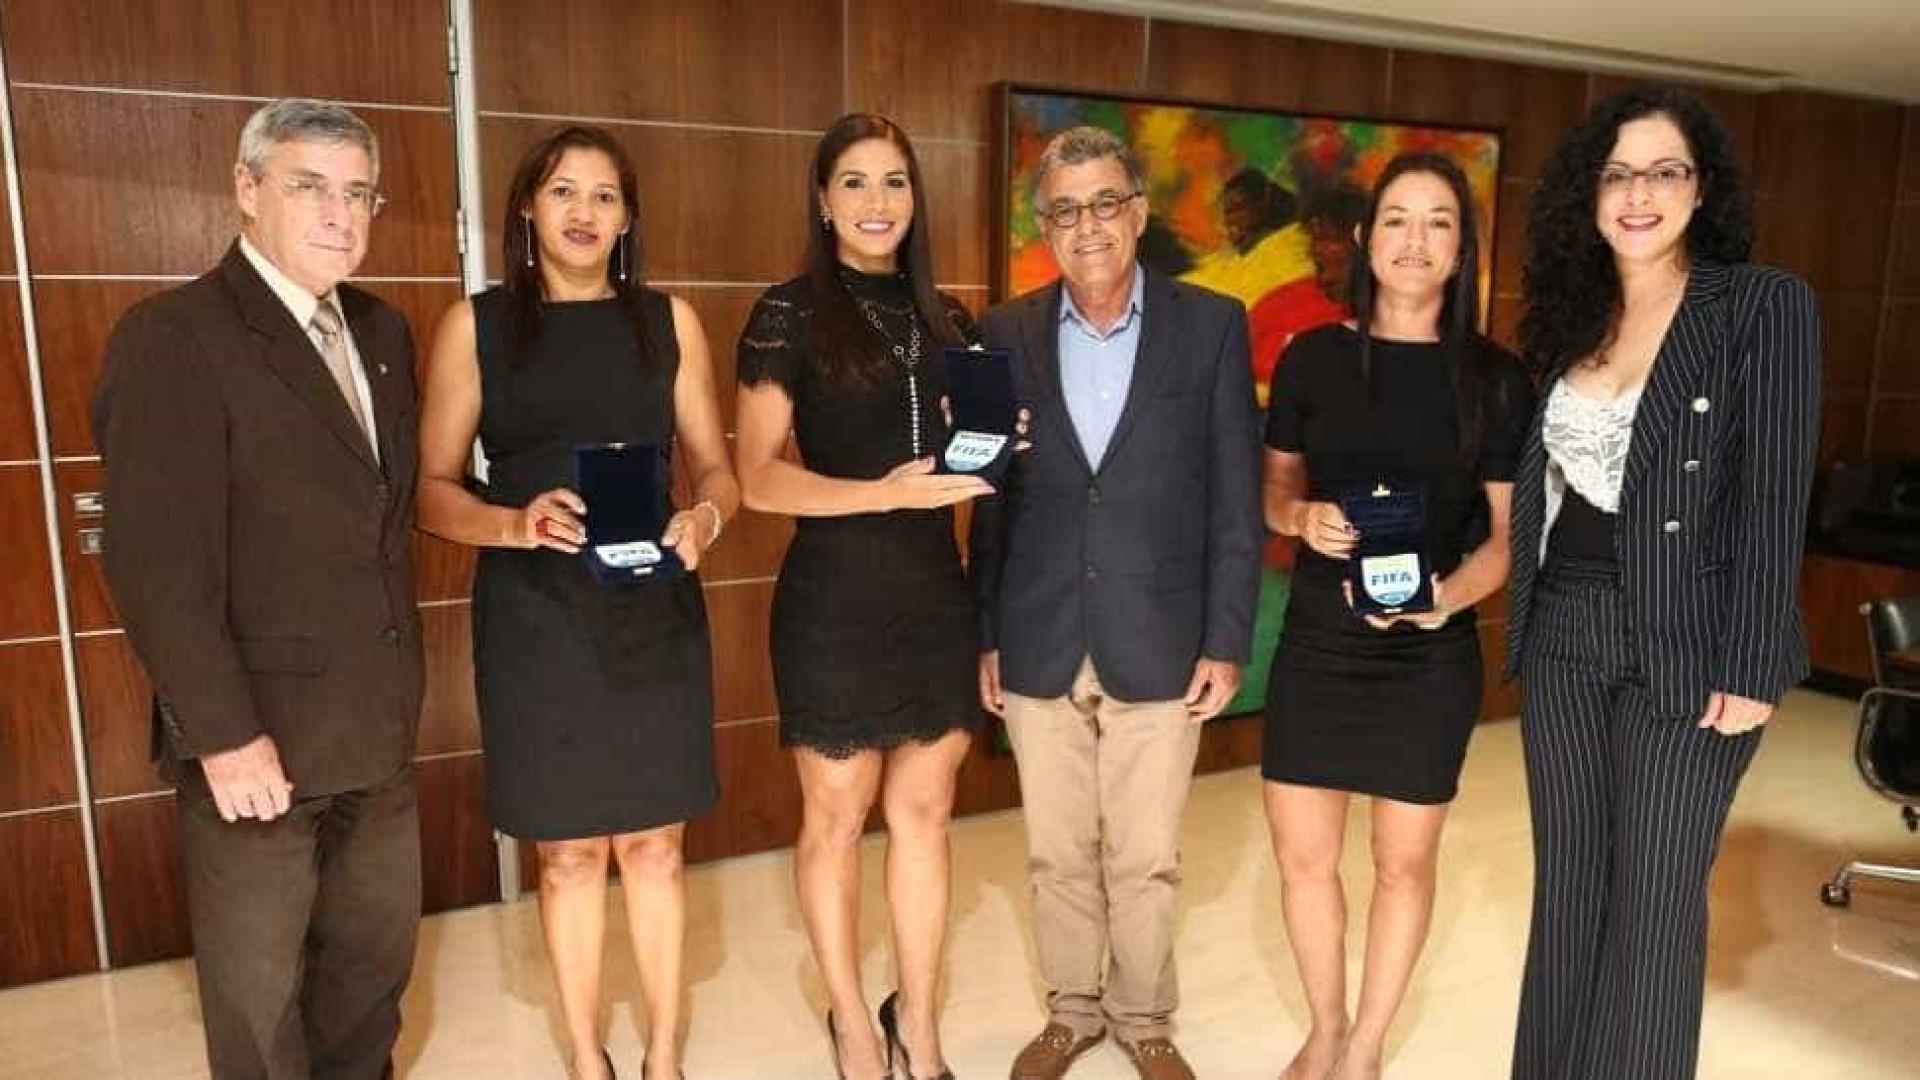 Trio de arbitragem feminino recebe insígnias FIFA